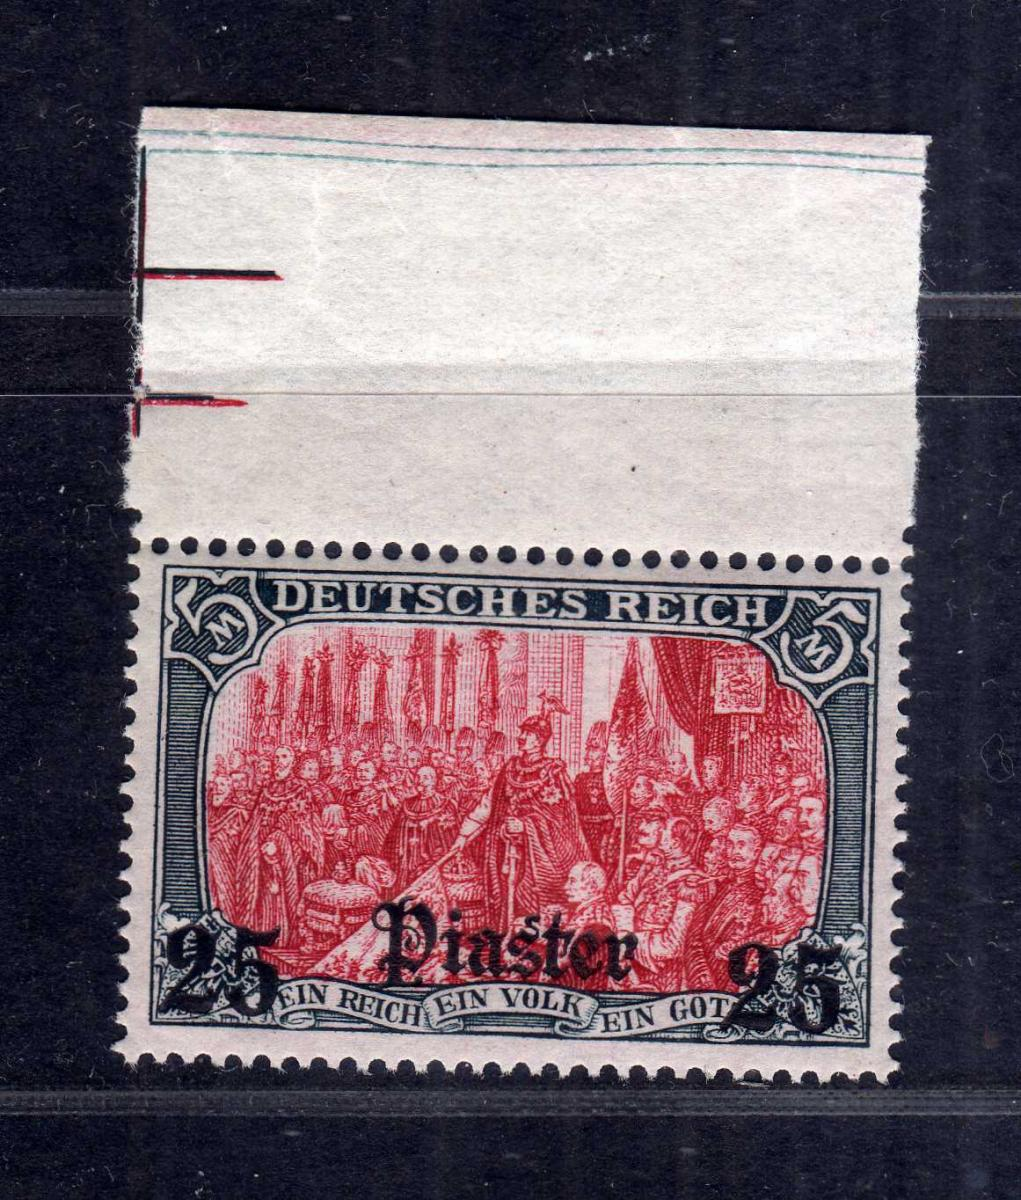 B2650 DP in der Türkei 35 a postfrisch